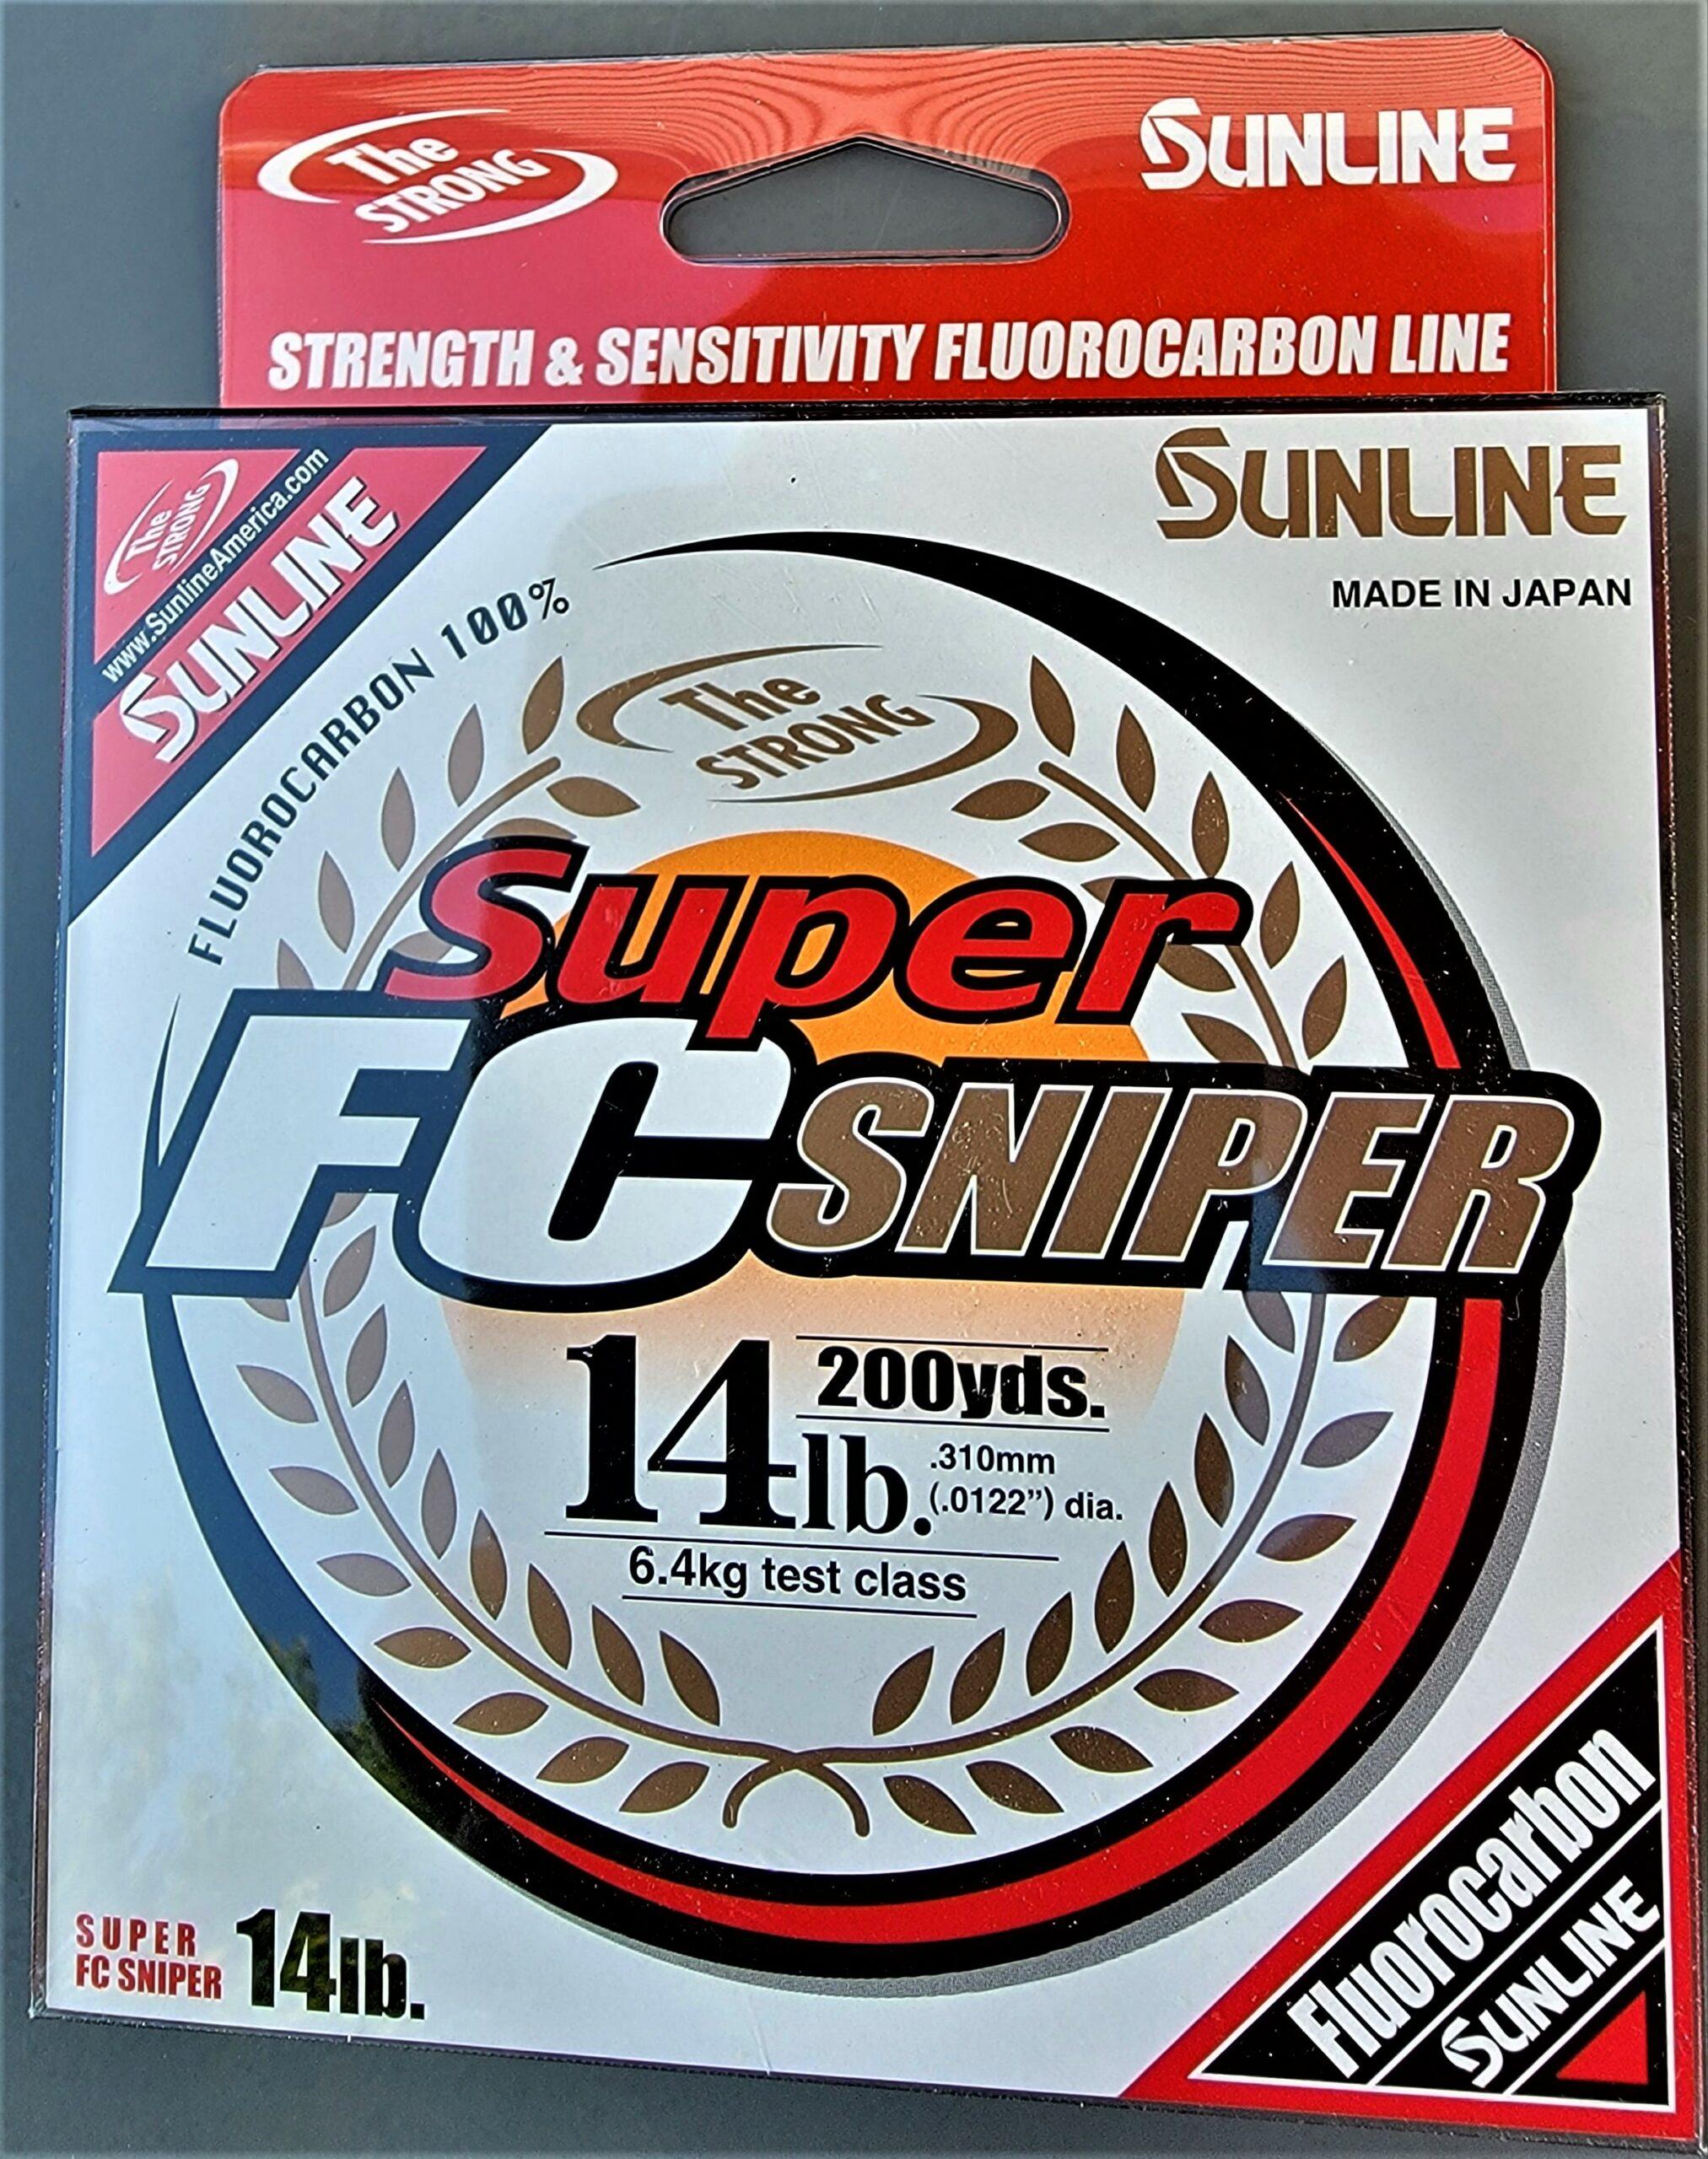 Sunline - Super FC Sniper - 200 YD - Super FC Sniper - 14 LB - Natural Clear